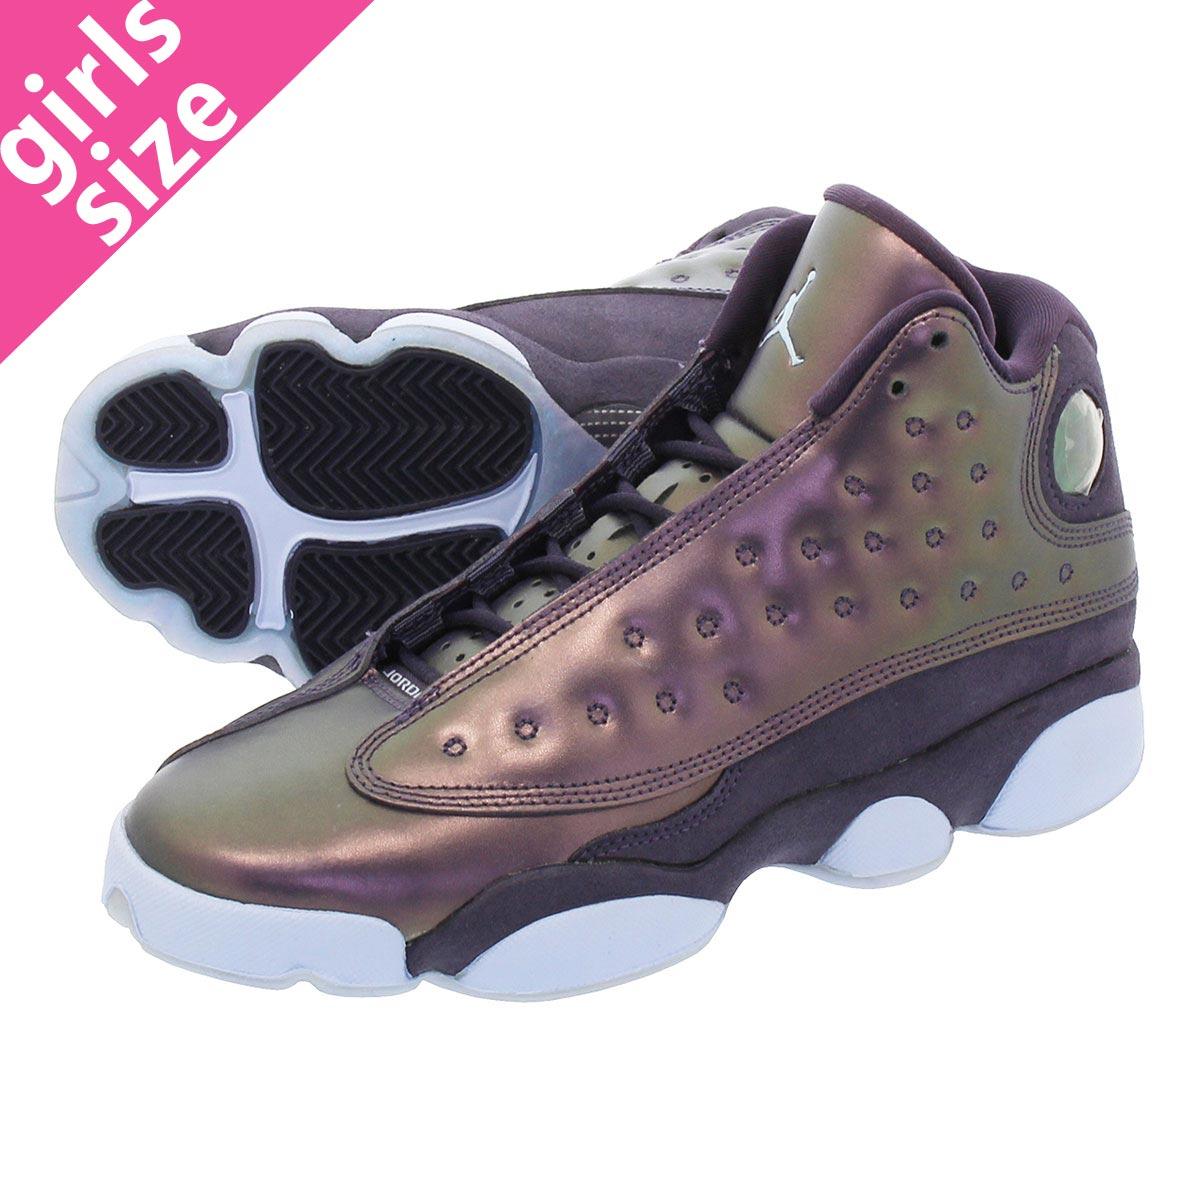 aceb5e5b LOWTEX PLUS: NIKE AIR JORDAN 13 RETRO Nike Air Jordan 13 nostalgic GG DARK  RAISIN/HYDROGEN BLUE aa1236-520 | Rakuten Global Market